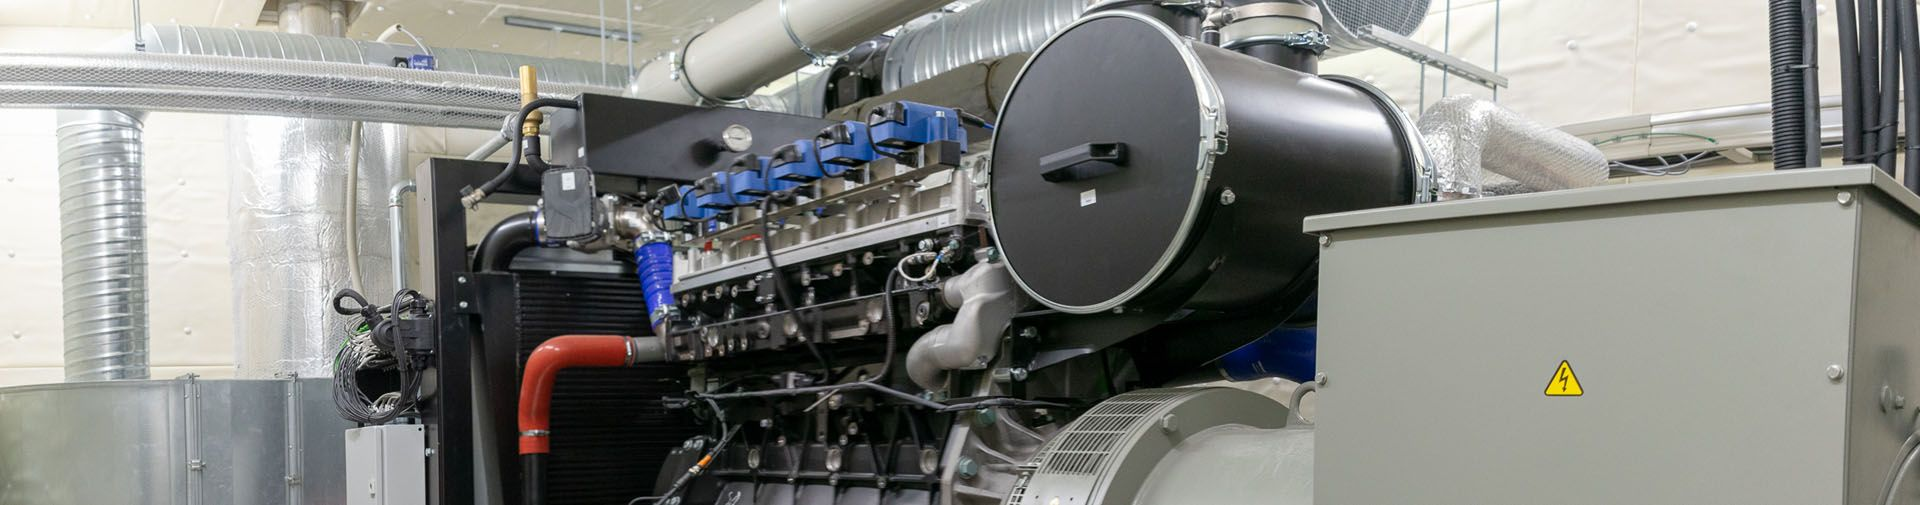 Was ist Kraft-Waerme-Kopplung (KWK)?